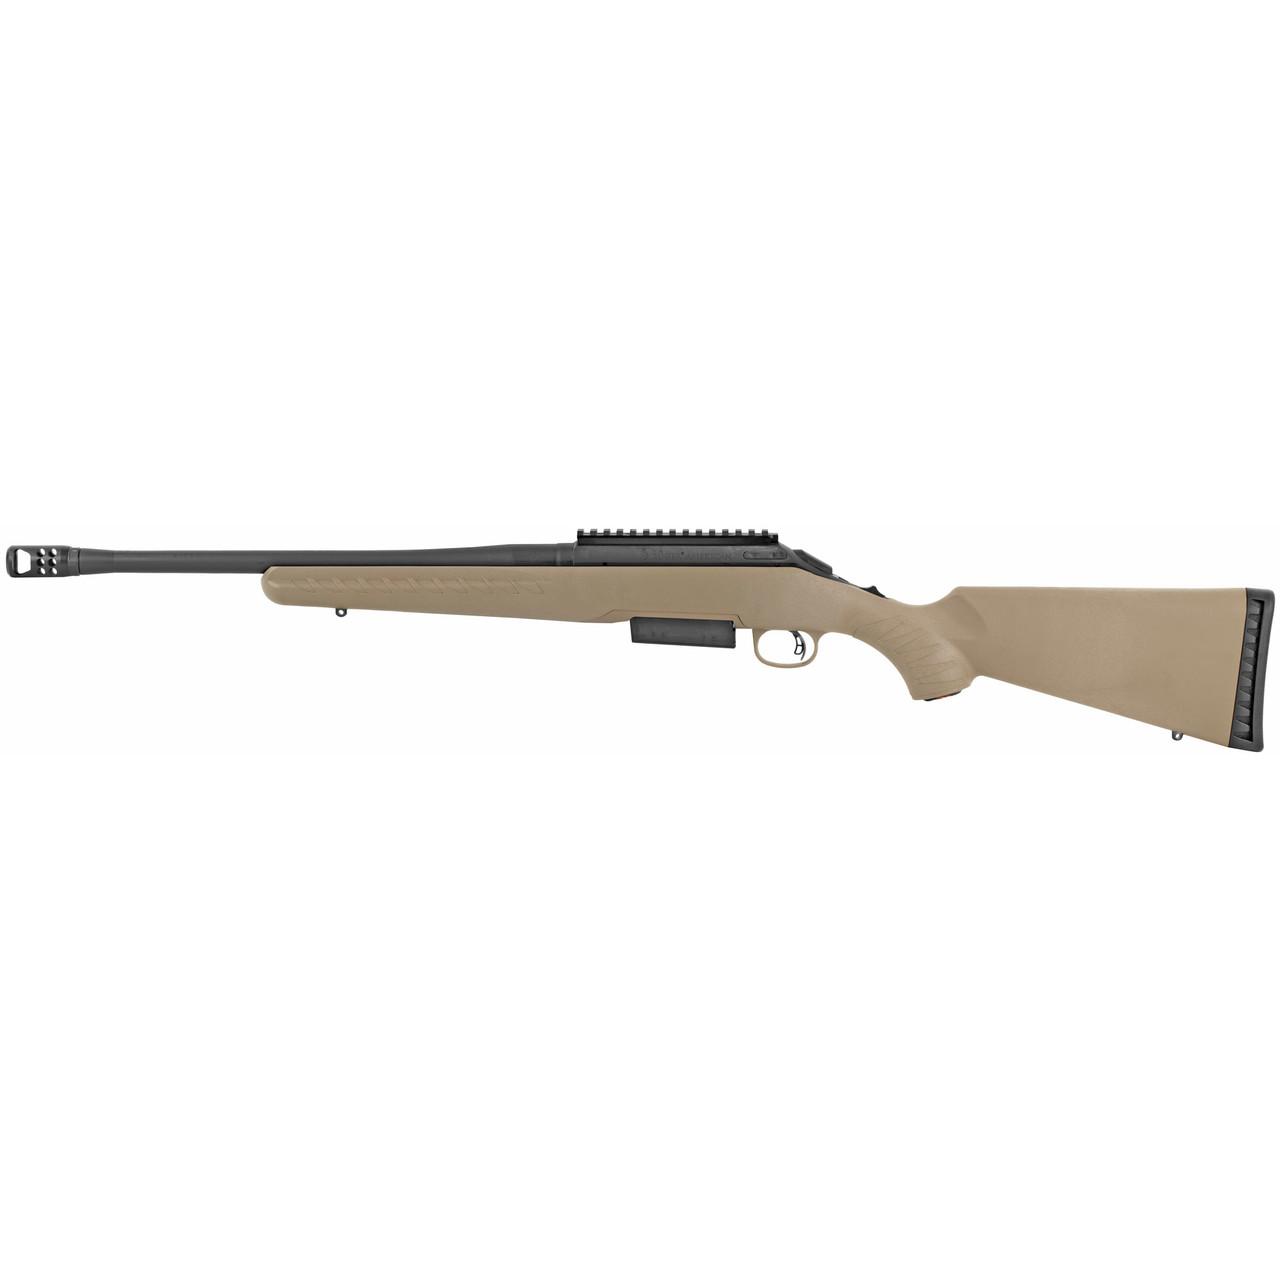 Ruger American Ranch Bolt Action CALIFORNIA LEGAL - .450 Bushmaster - FDE